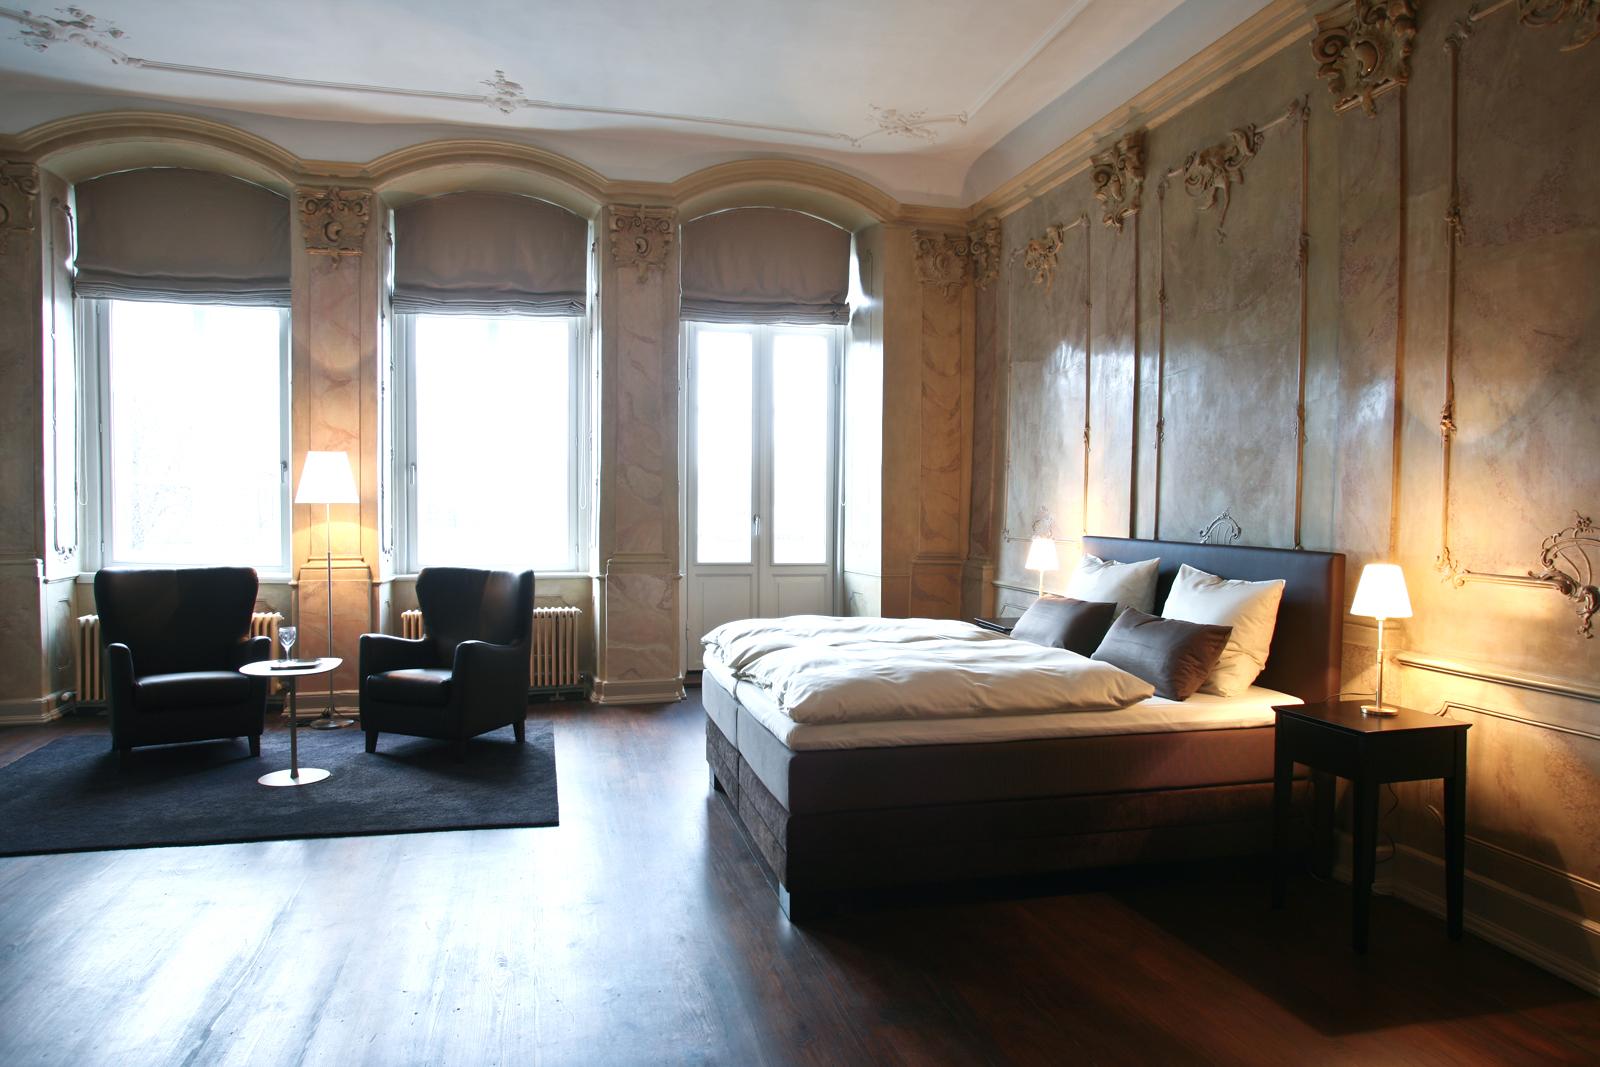 exclusive suites | hotel anno 1216 in the city of lübeck